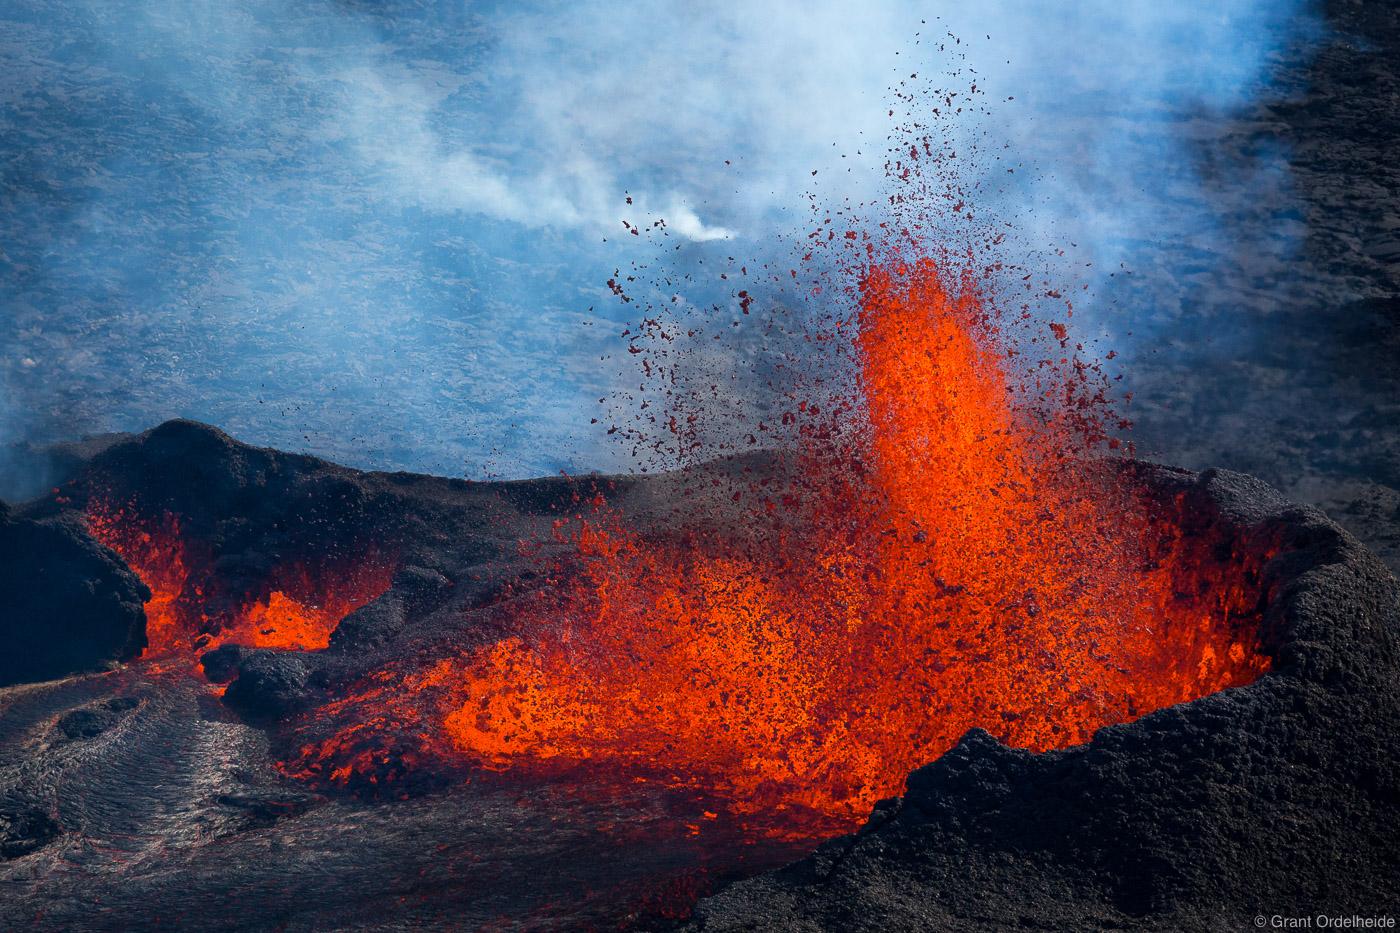 lava, volcanic, eruption, vatnajökull, iceland, fissure, bardarbunga, volcano, holuhraun, field, photo